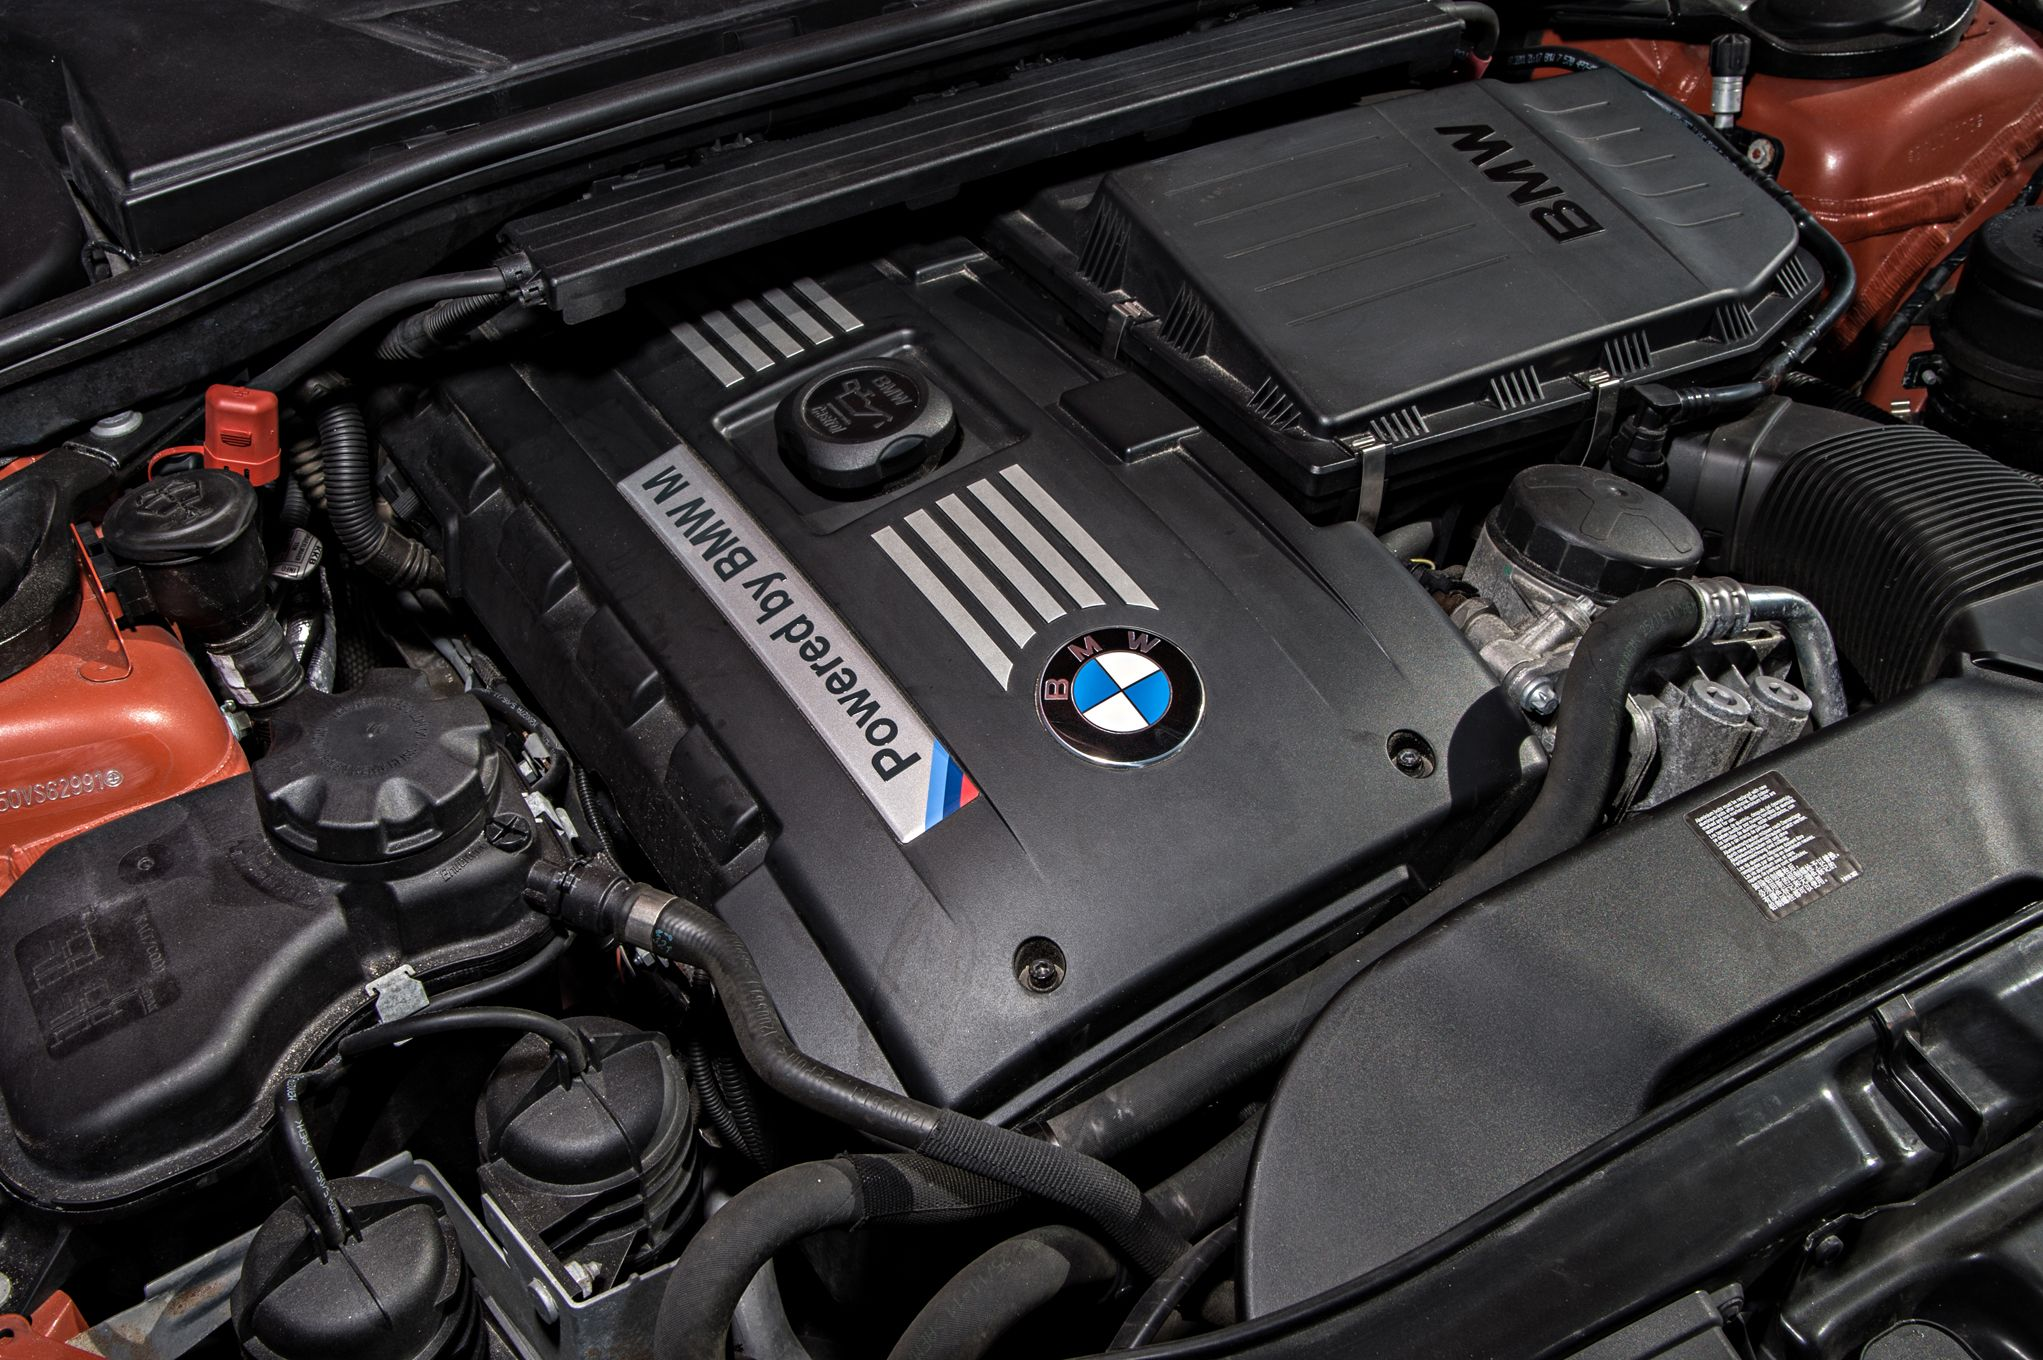 bmw-1-series-m-coupe-engine.jpg